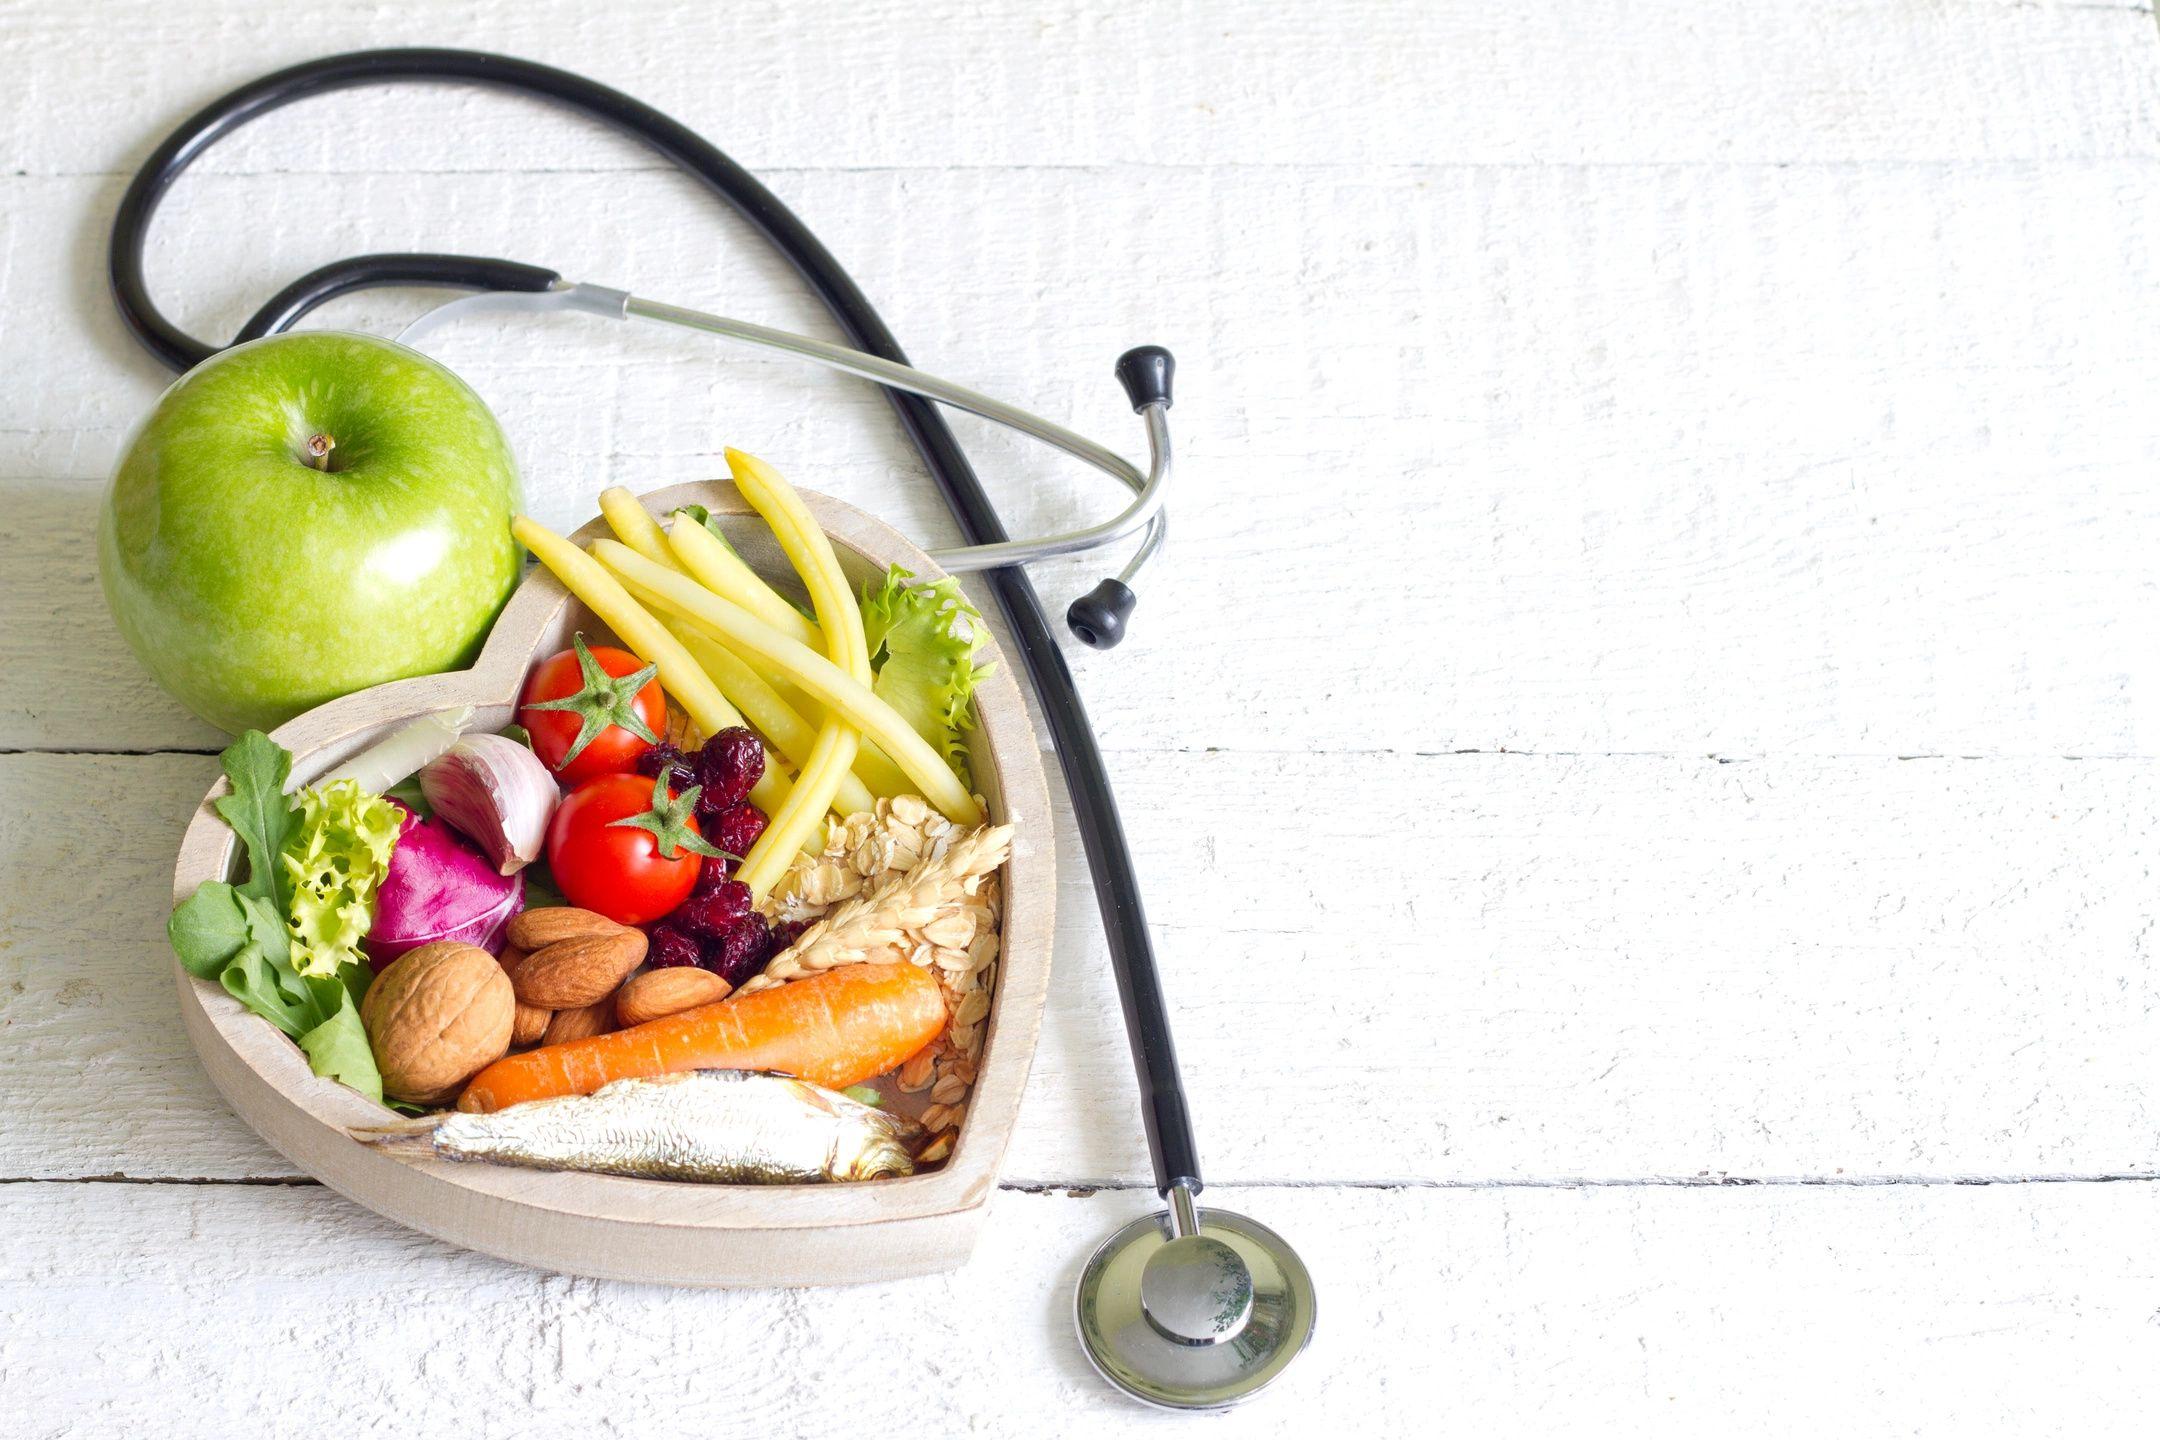 Marietta Parkersburg Weight Loss - Quality Care Associates Urgent Care and Wellness Center